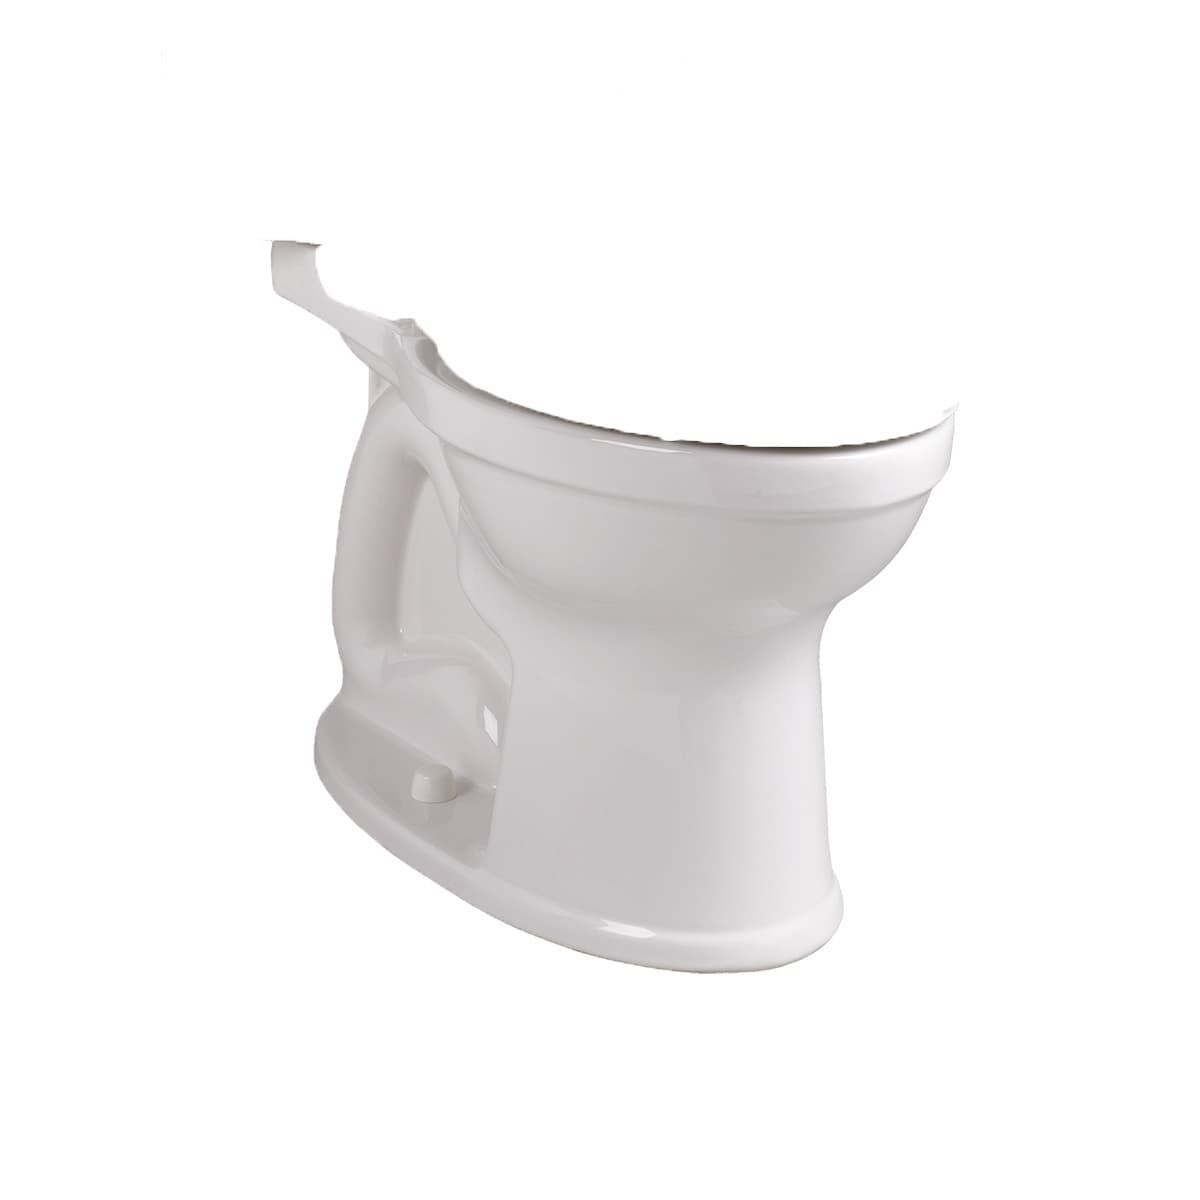 American Standard Chinaware Toilet Bowl (White)